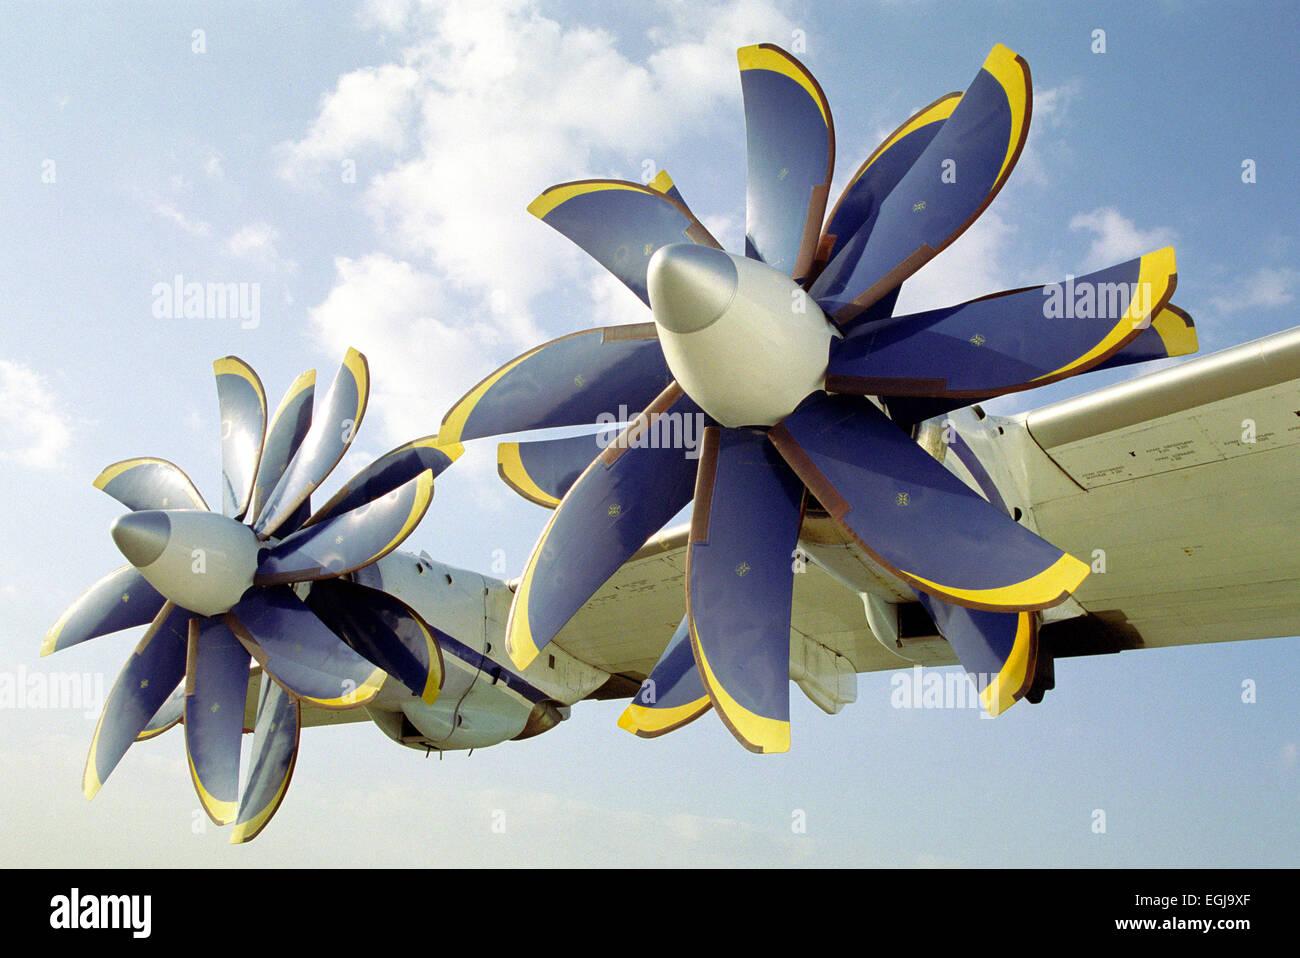 Propfan An-70 aircraft - Stock Image